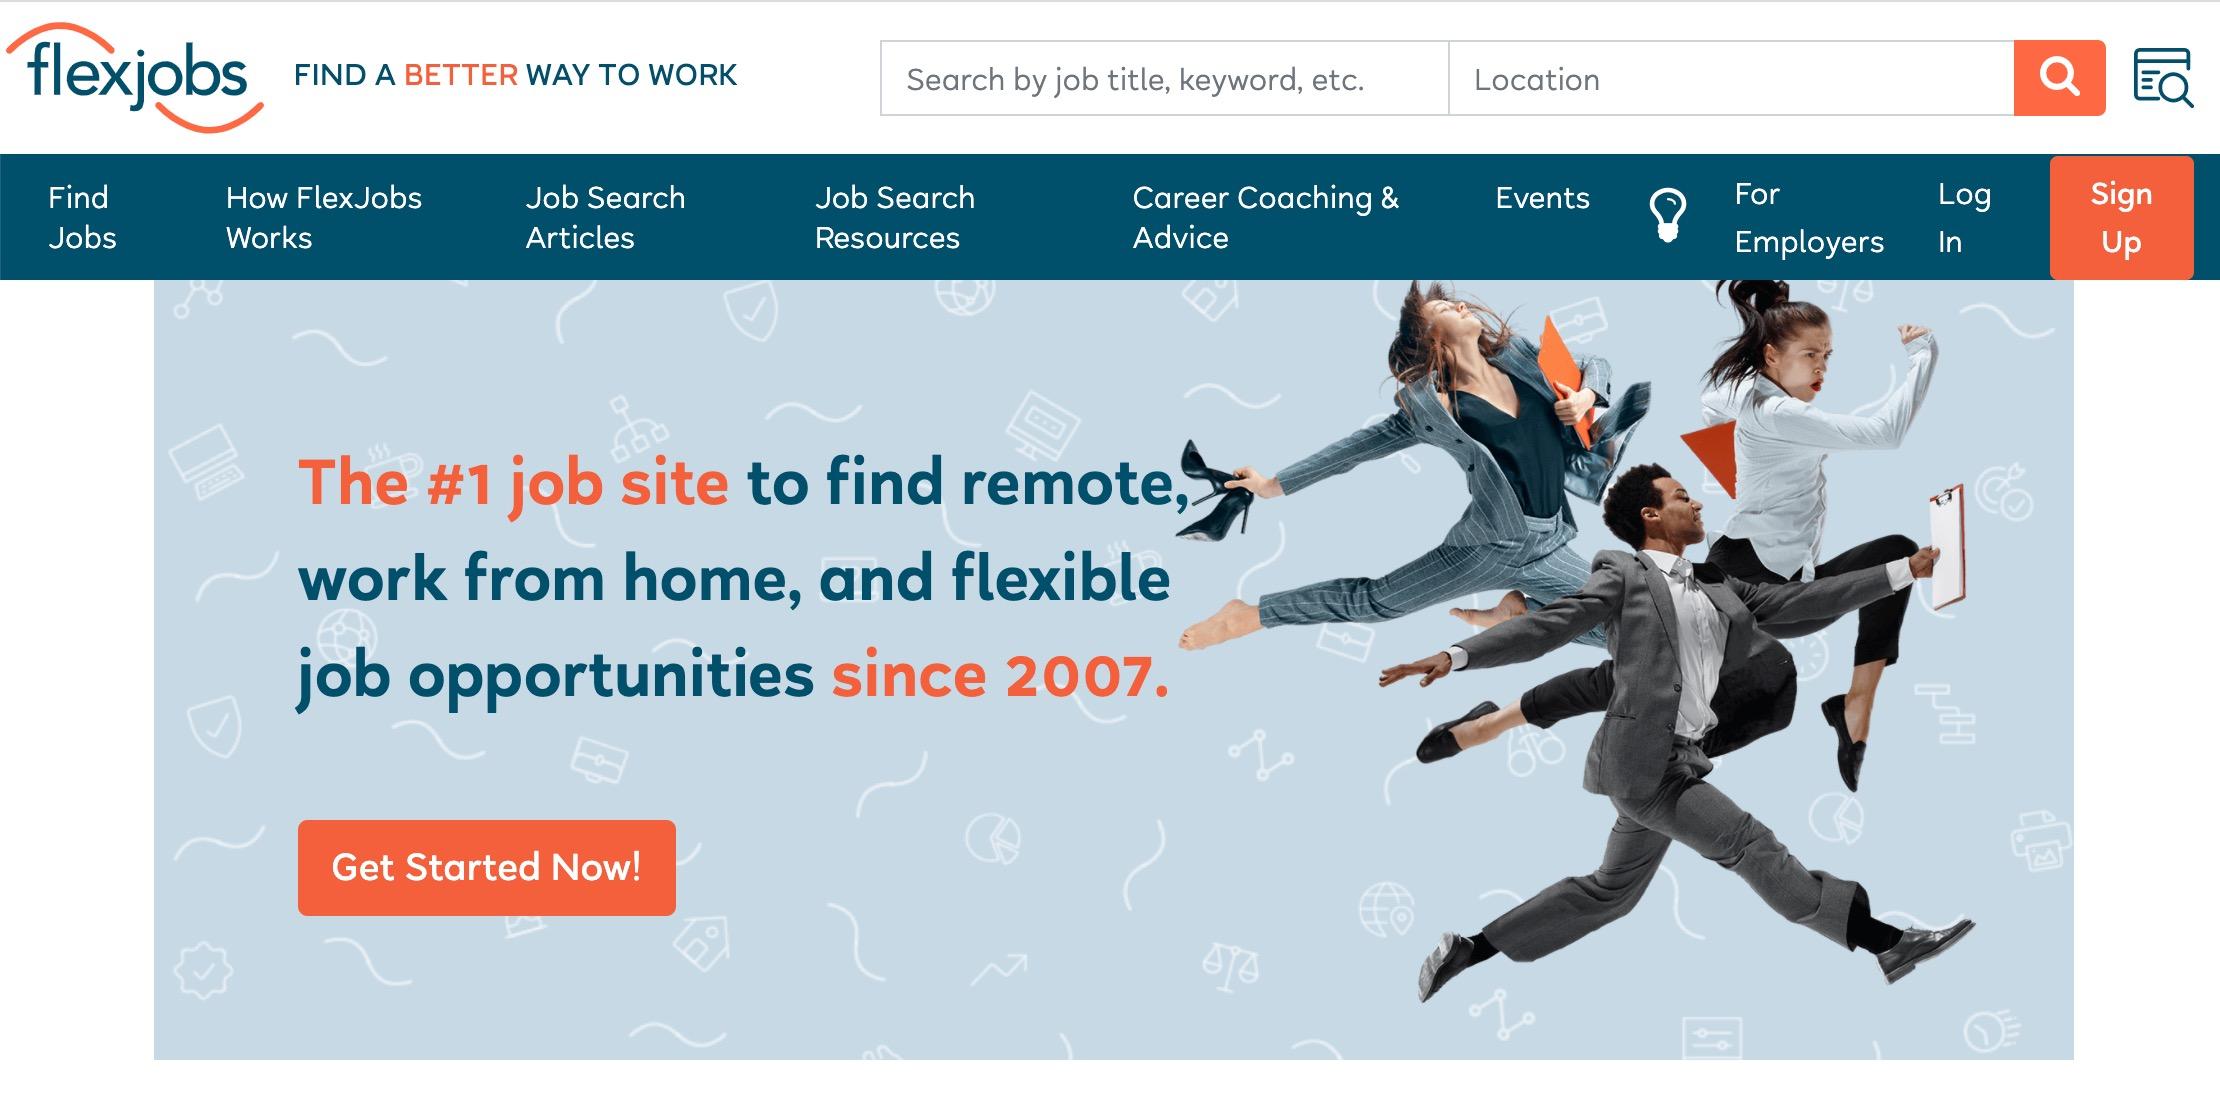 Entry-level marketing Flexjobs